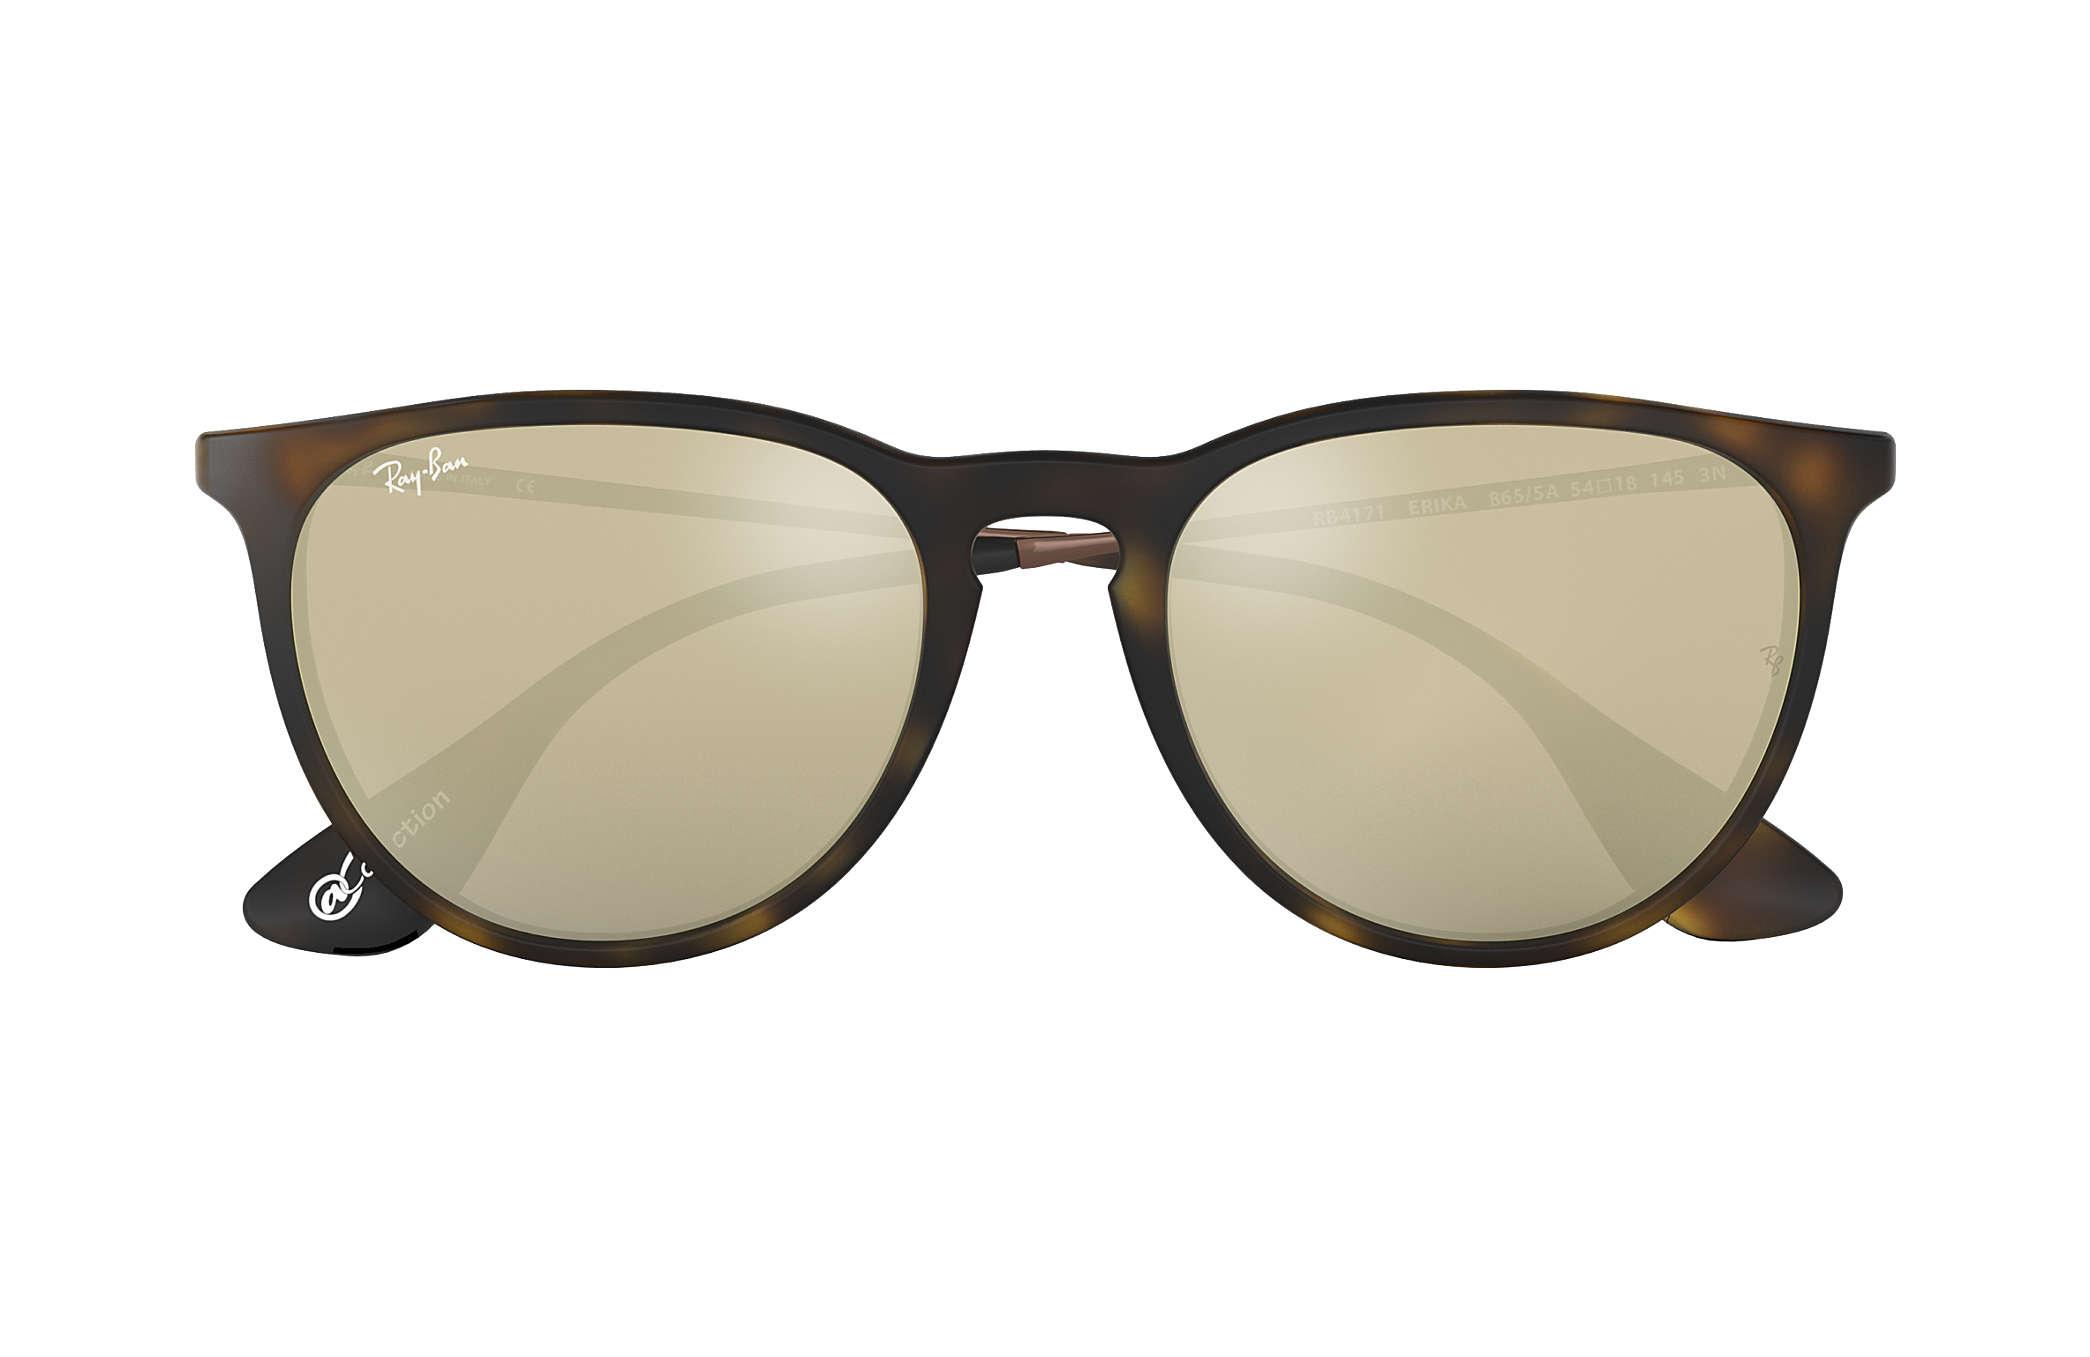 31a3b1069f631 Ray-Ban Erika  collection RB4171 Tortoise - Nylon - Gold Lenses ...